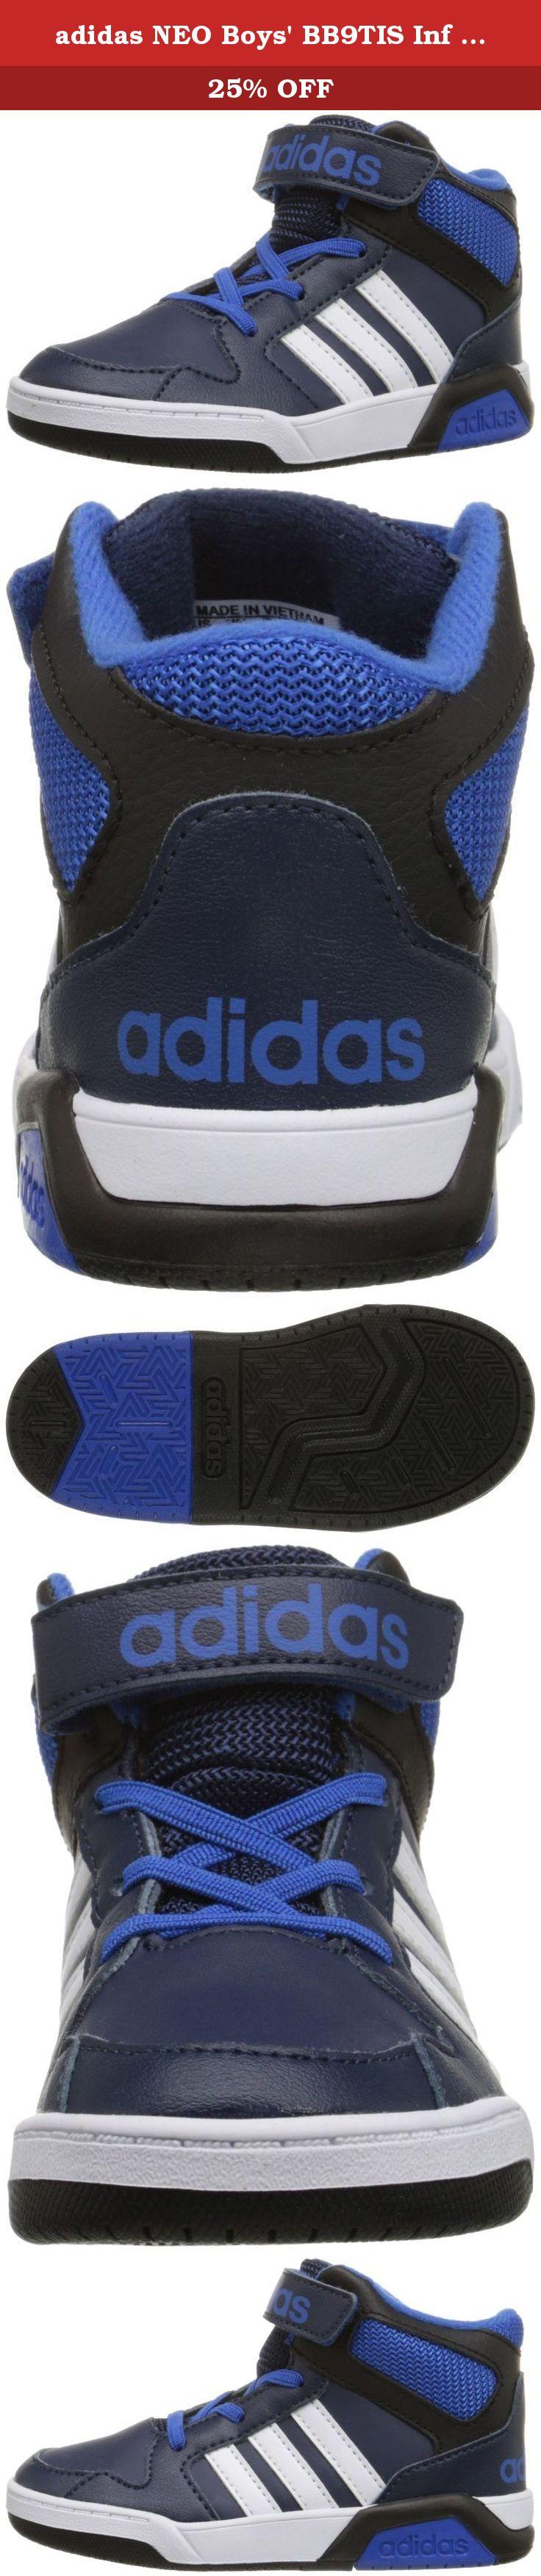 Adidas neo ragazzi marina